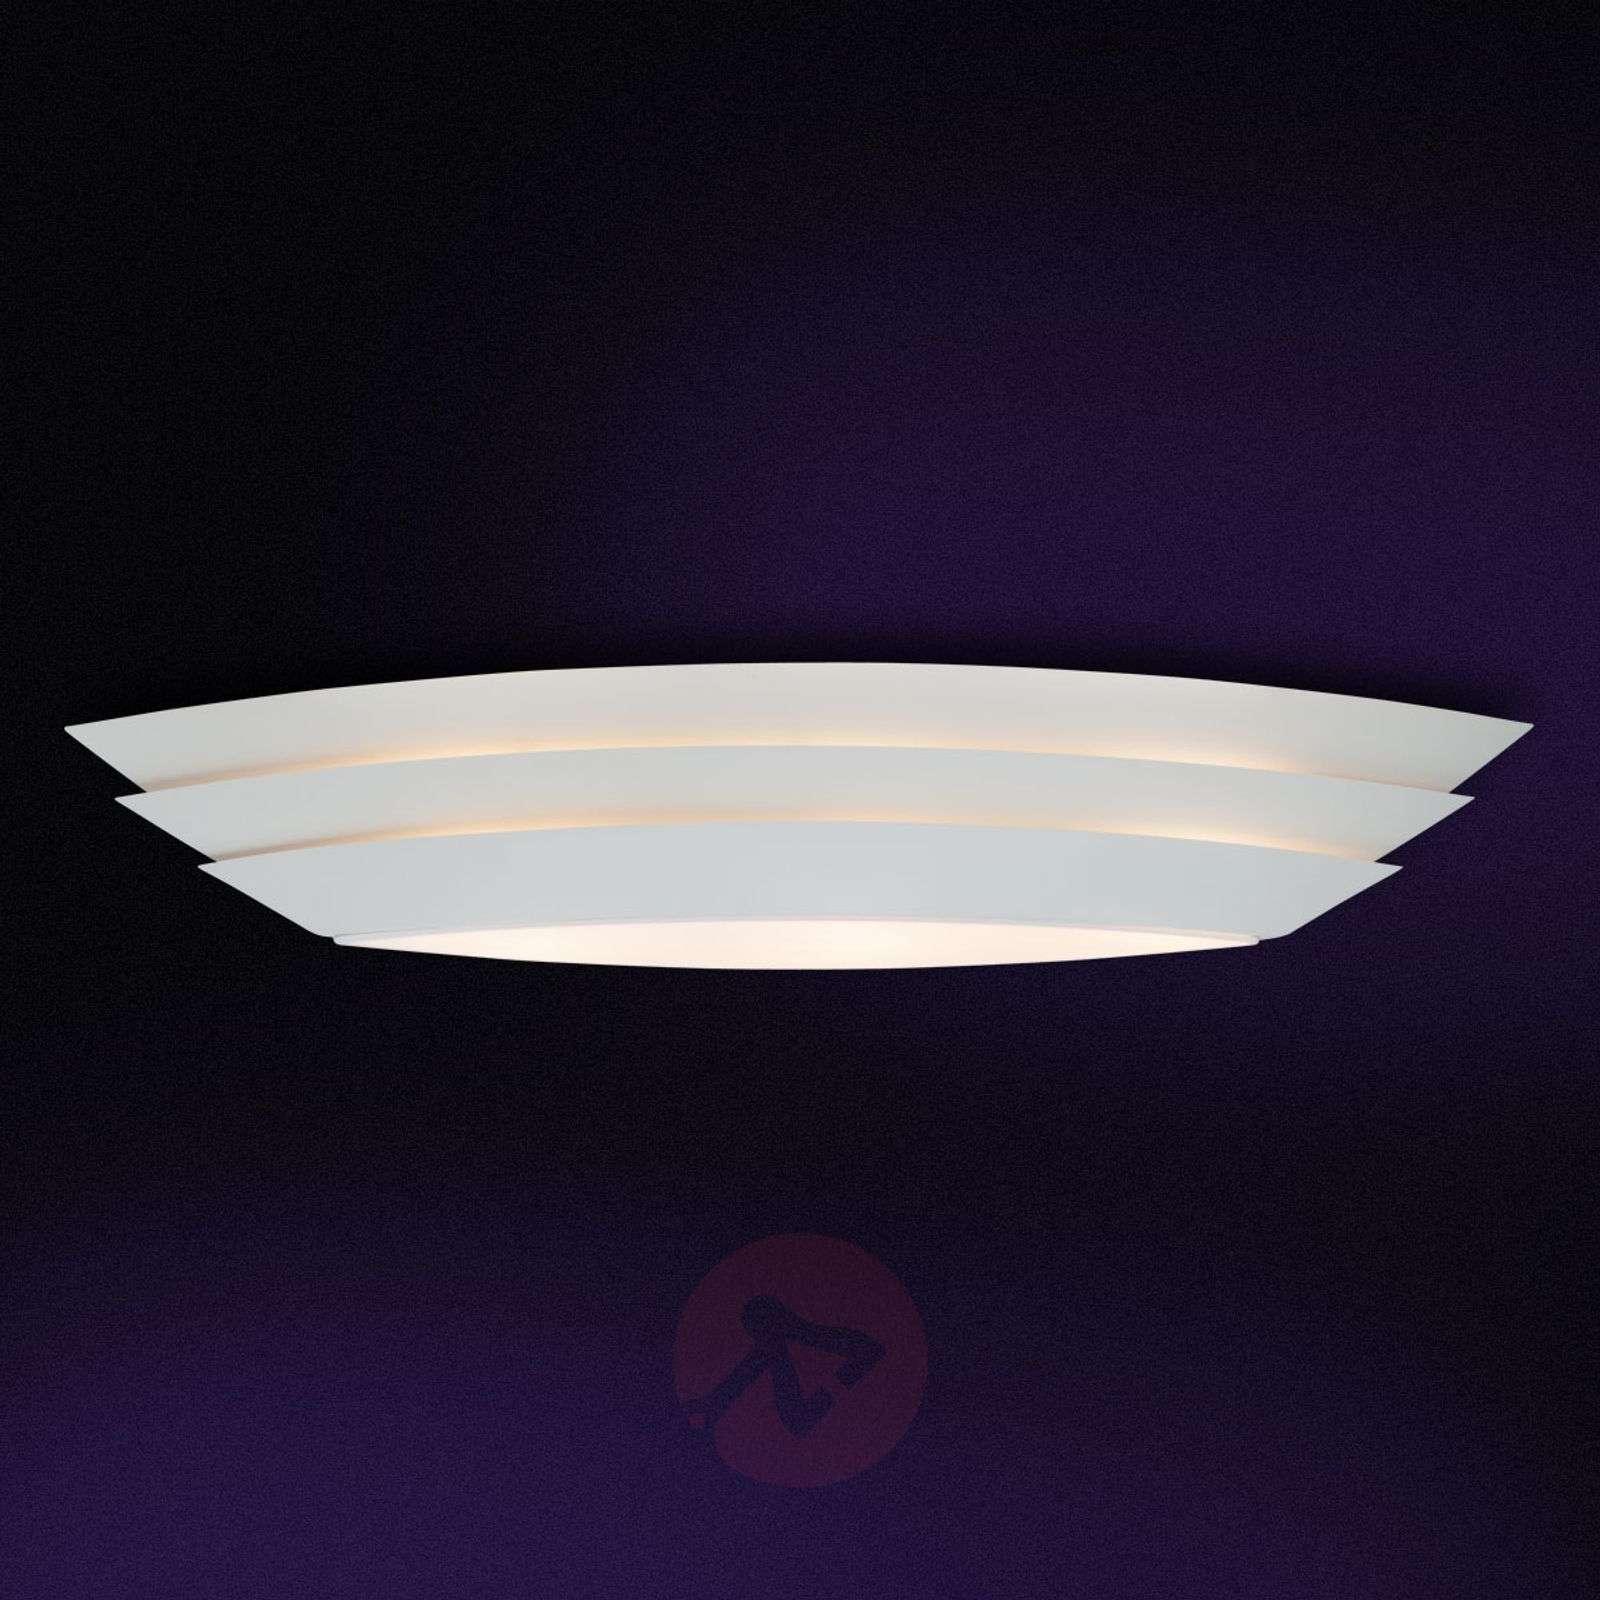 Interestingly shaped ceiling light Ship_1508920_1